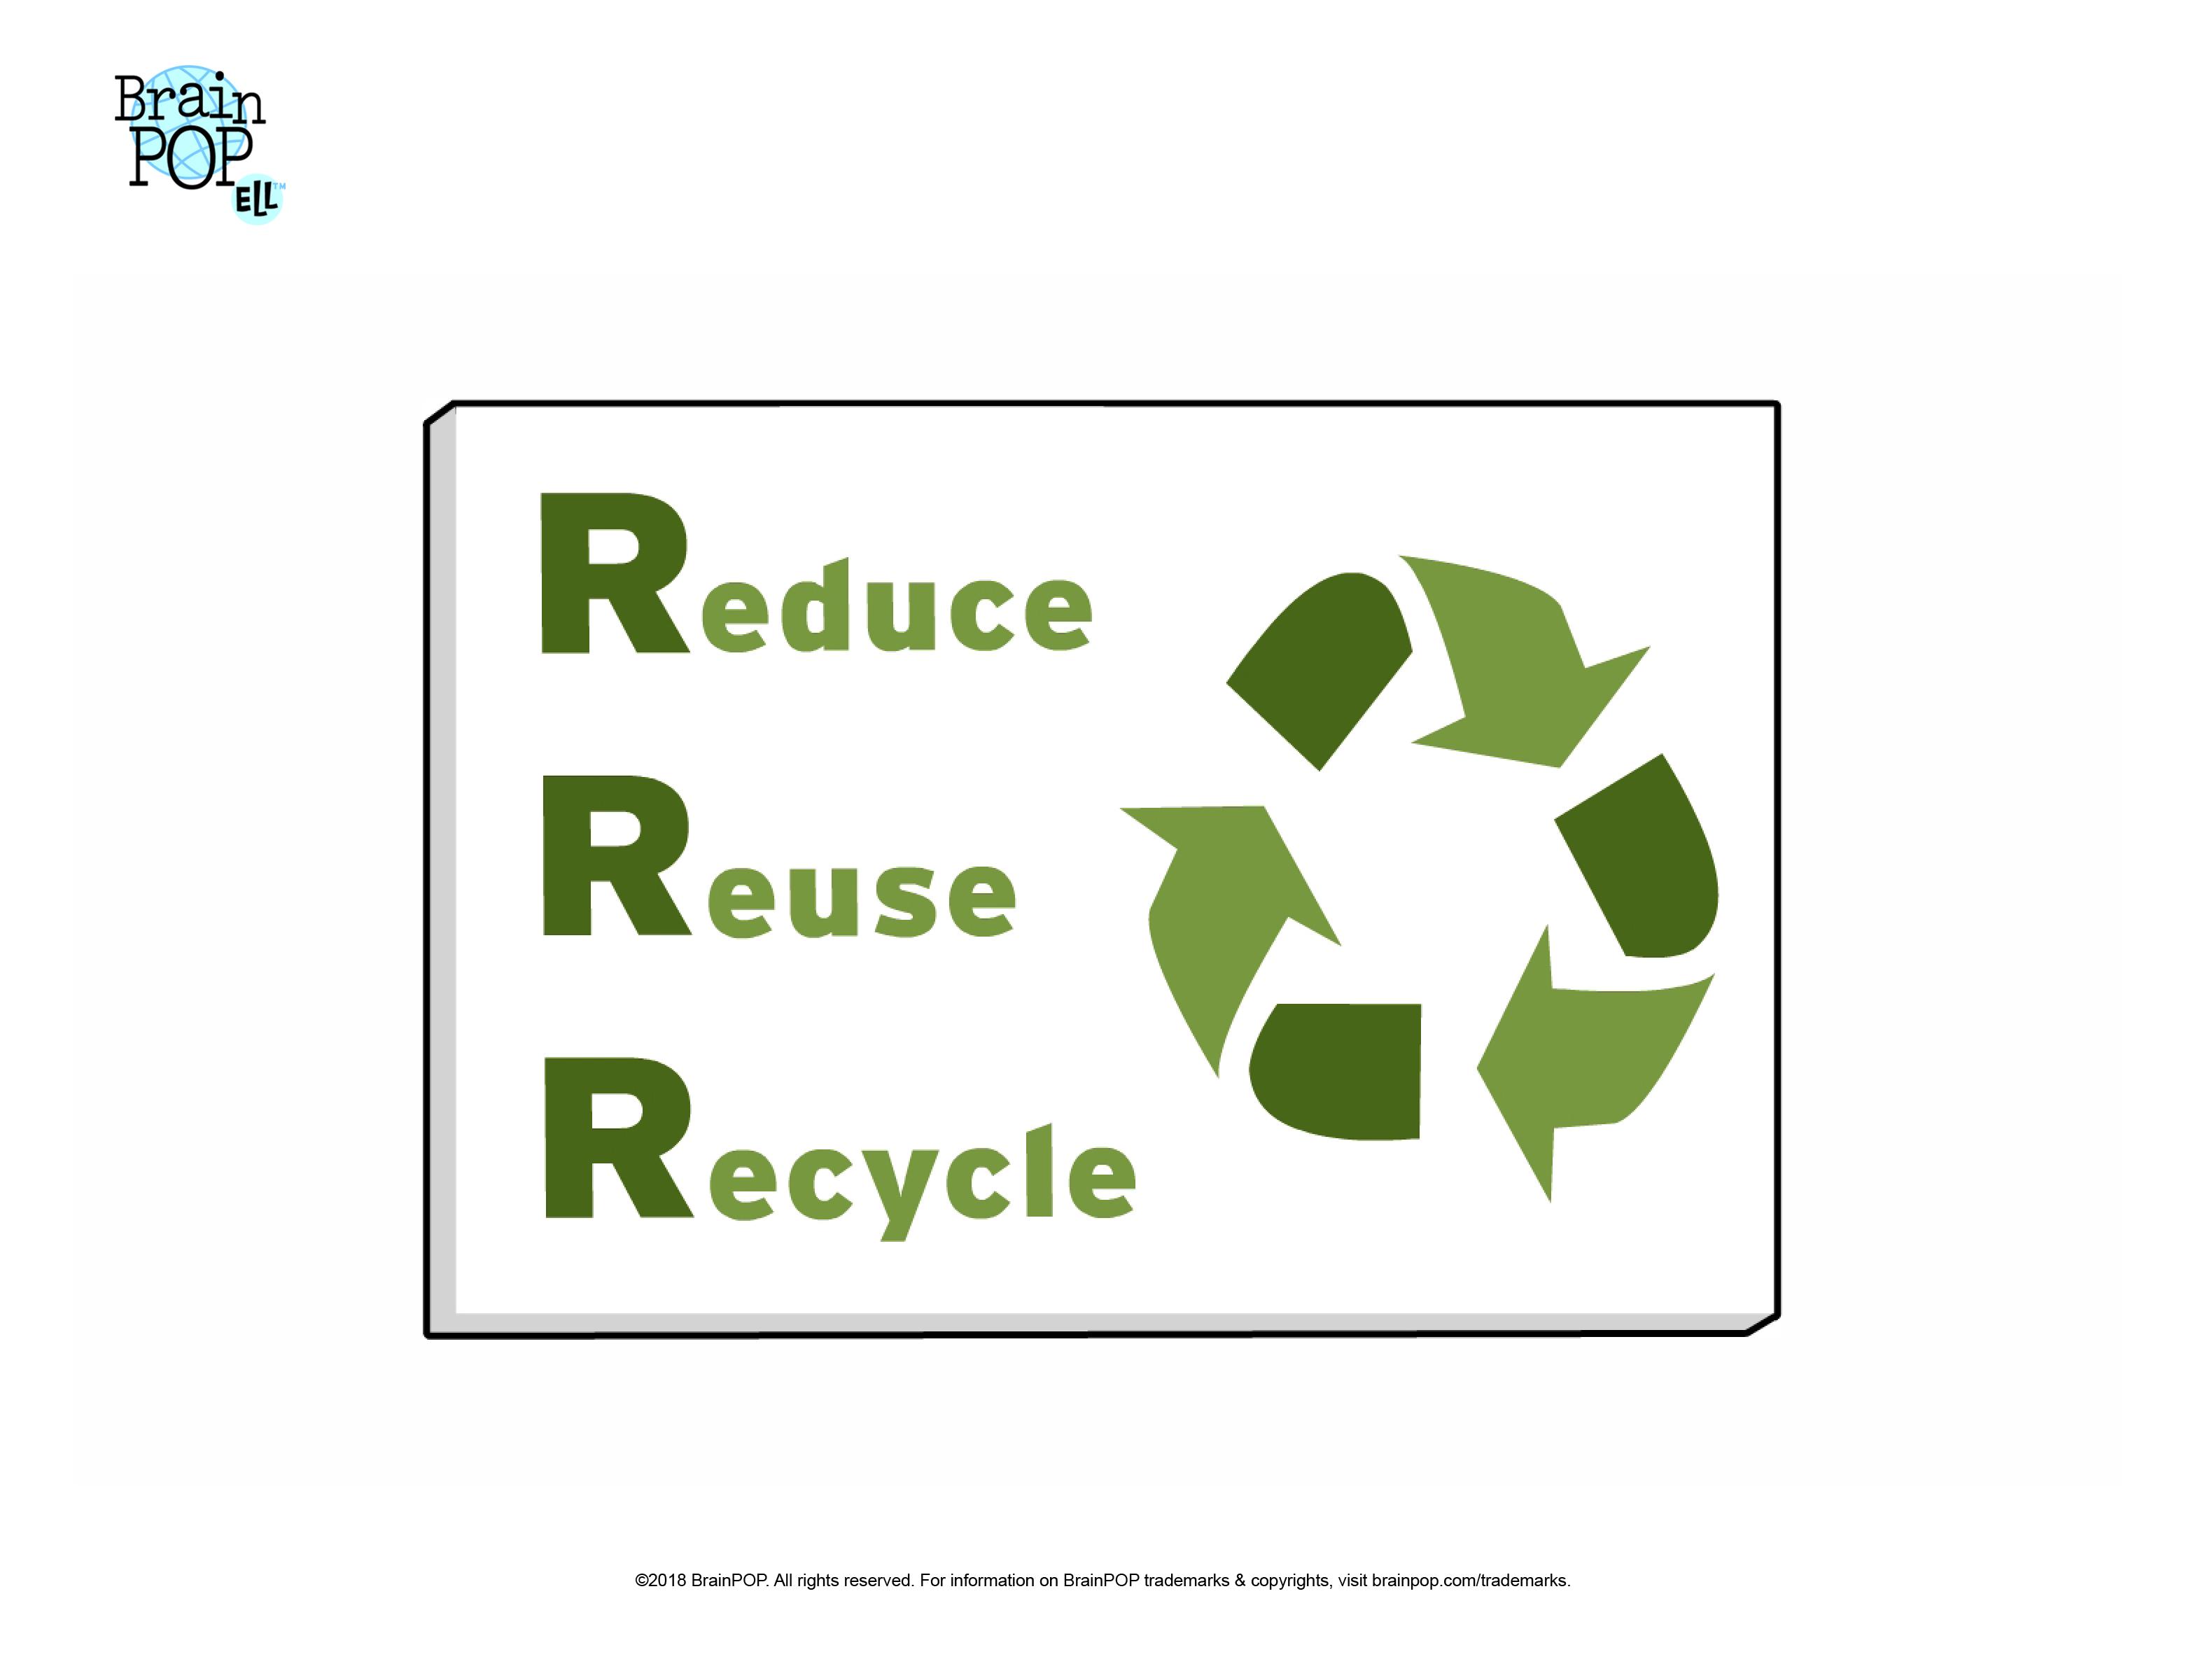 Reduce Reuse Recycle Image Brainpop Educators